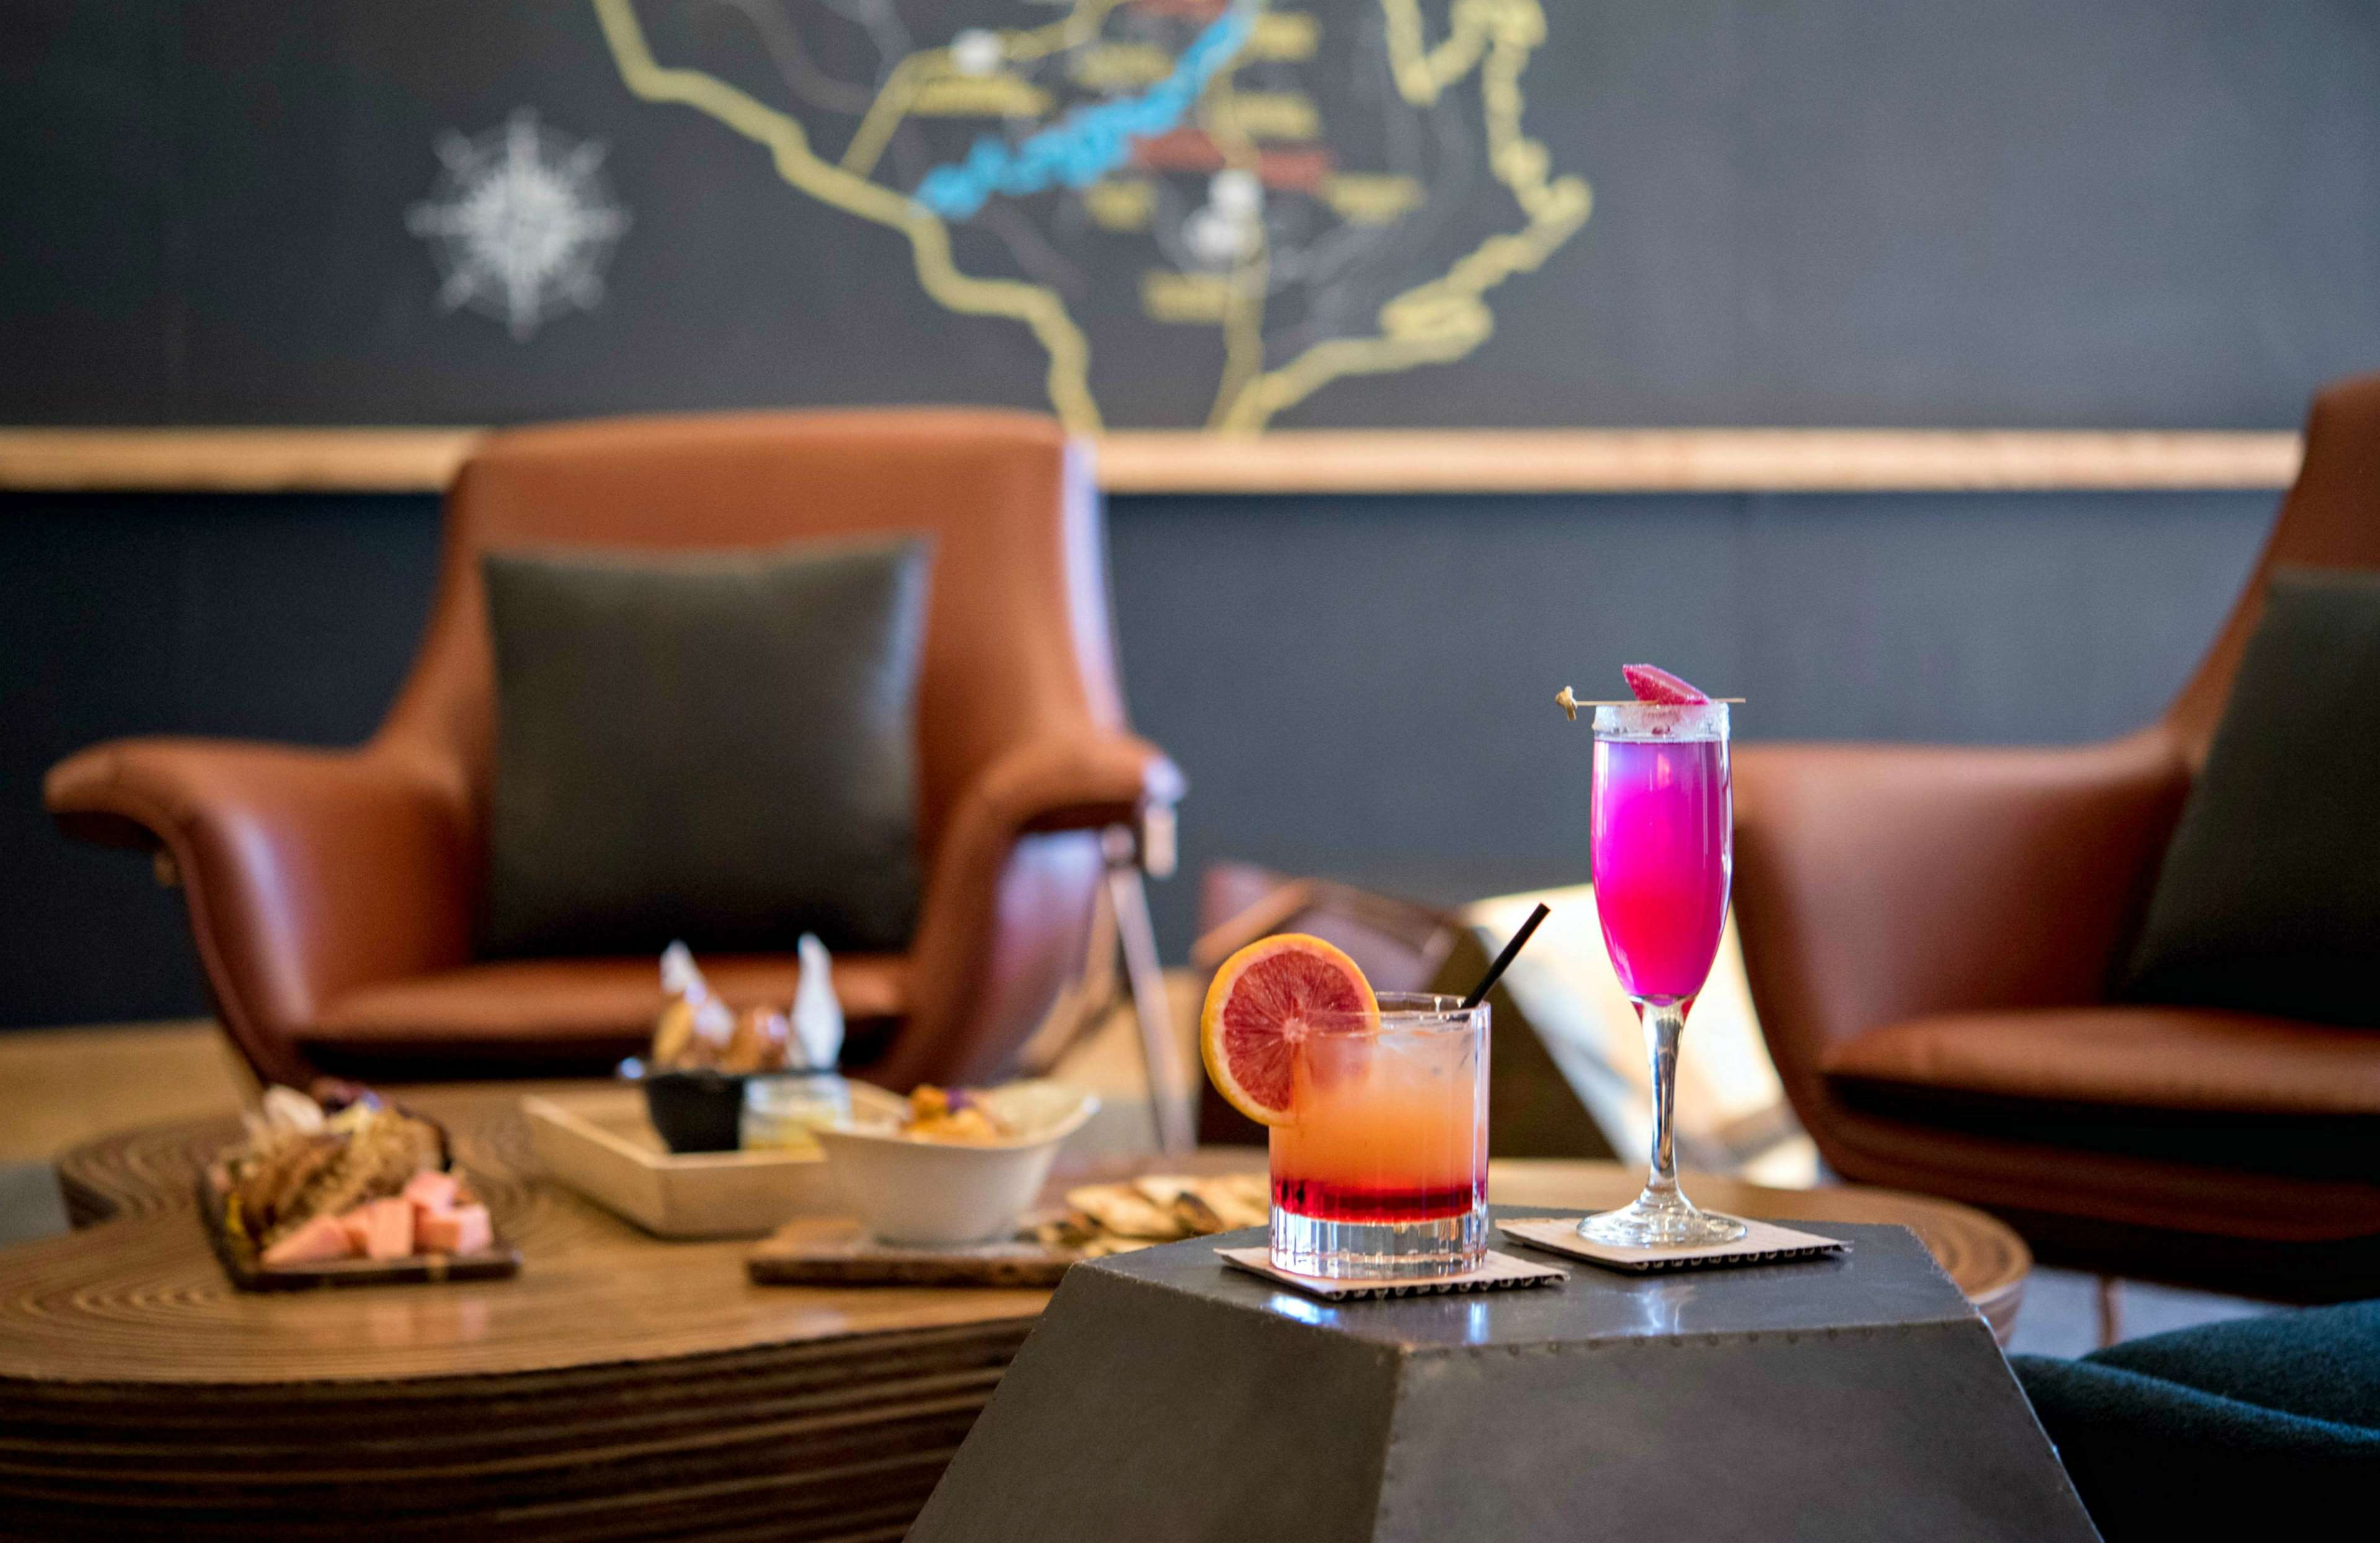 Hilton Sedona Resort at Bell Rock image 33